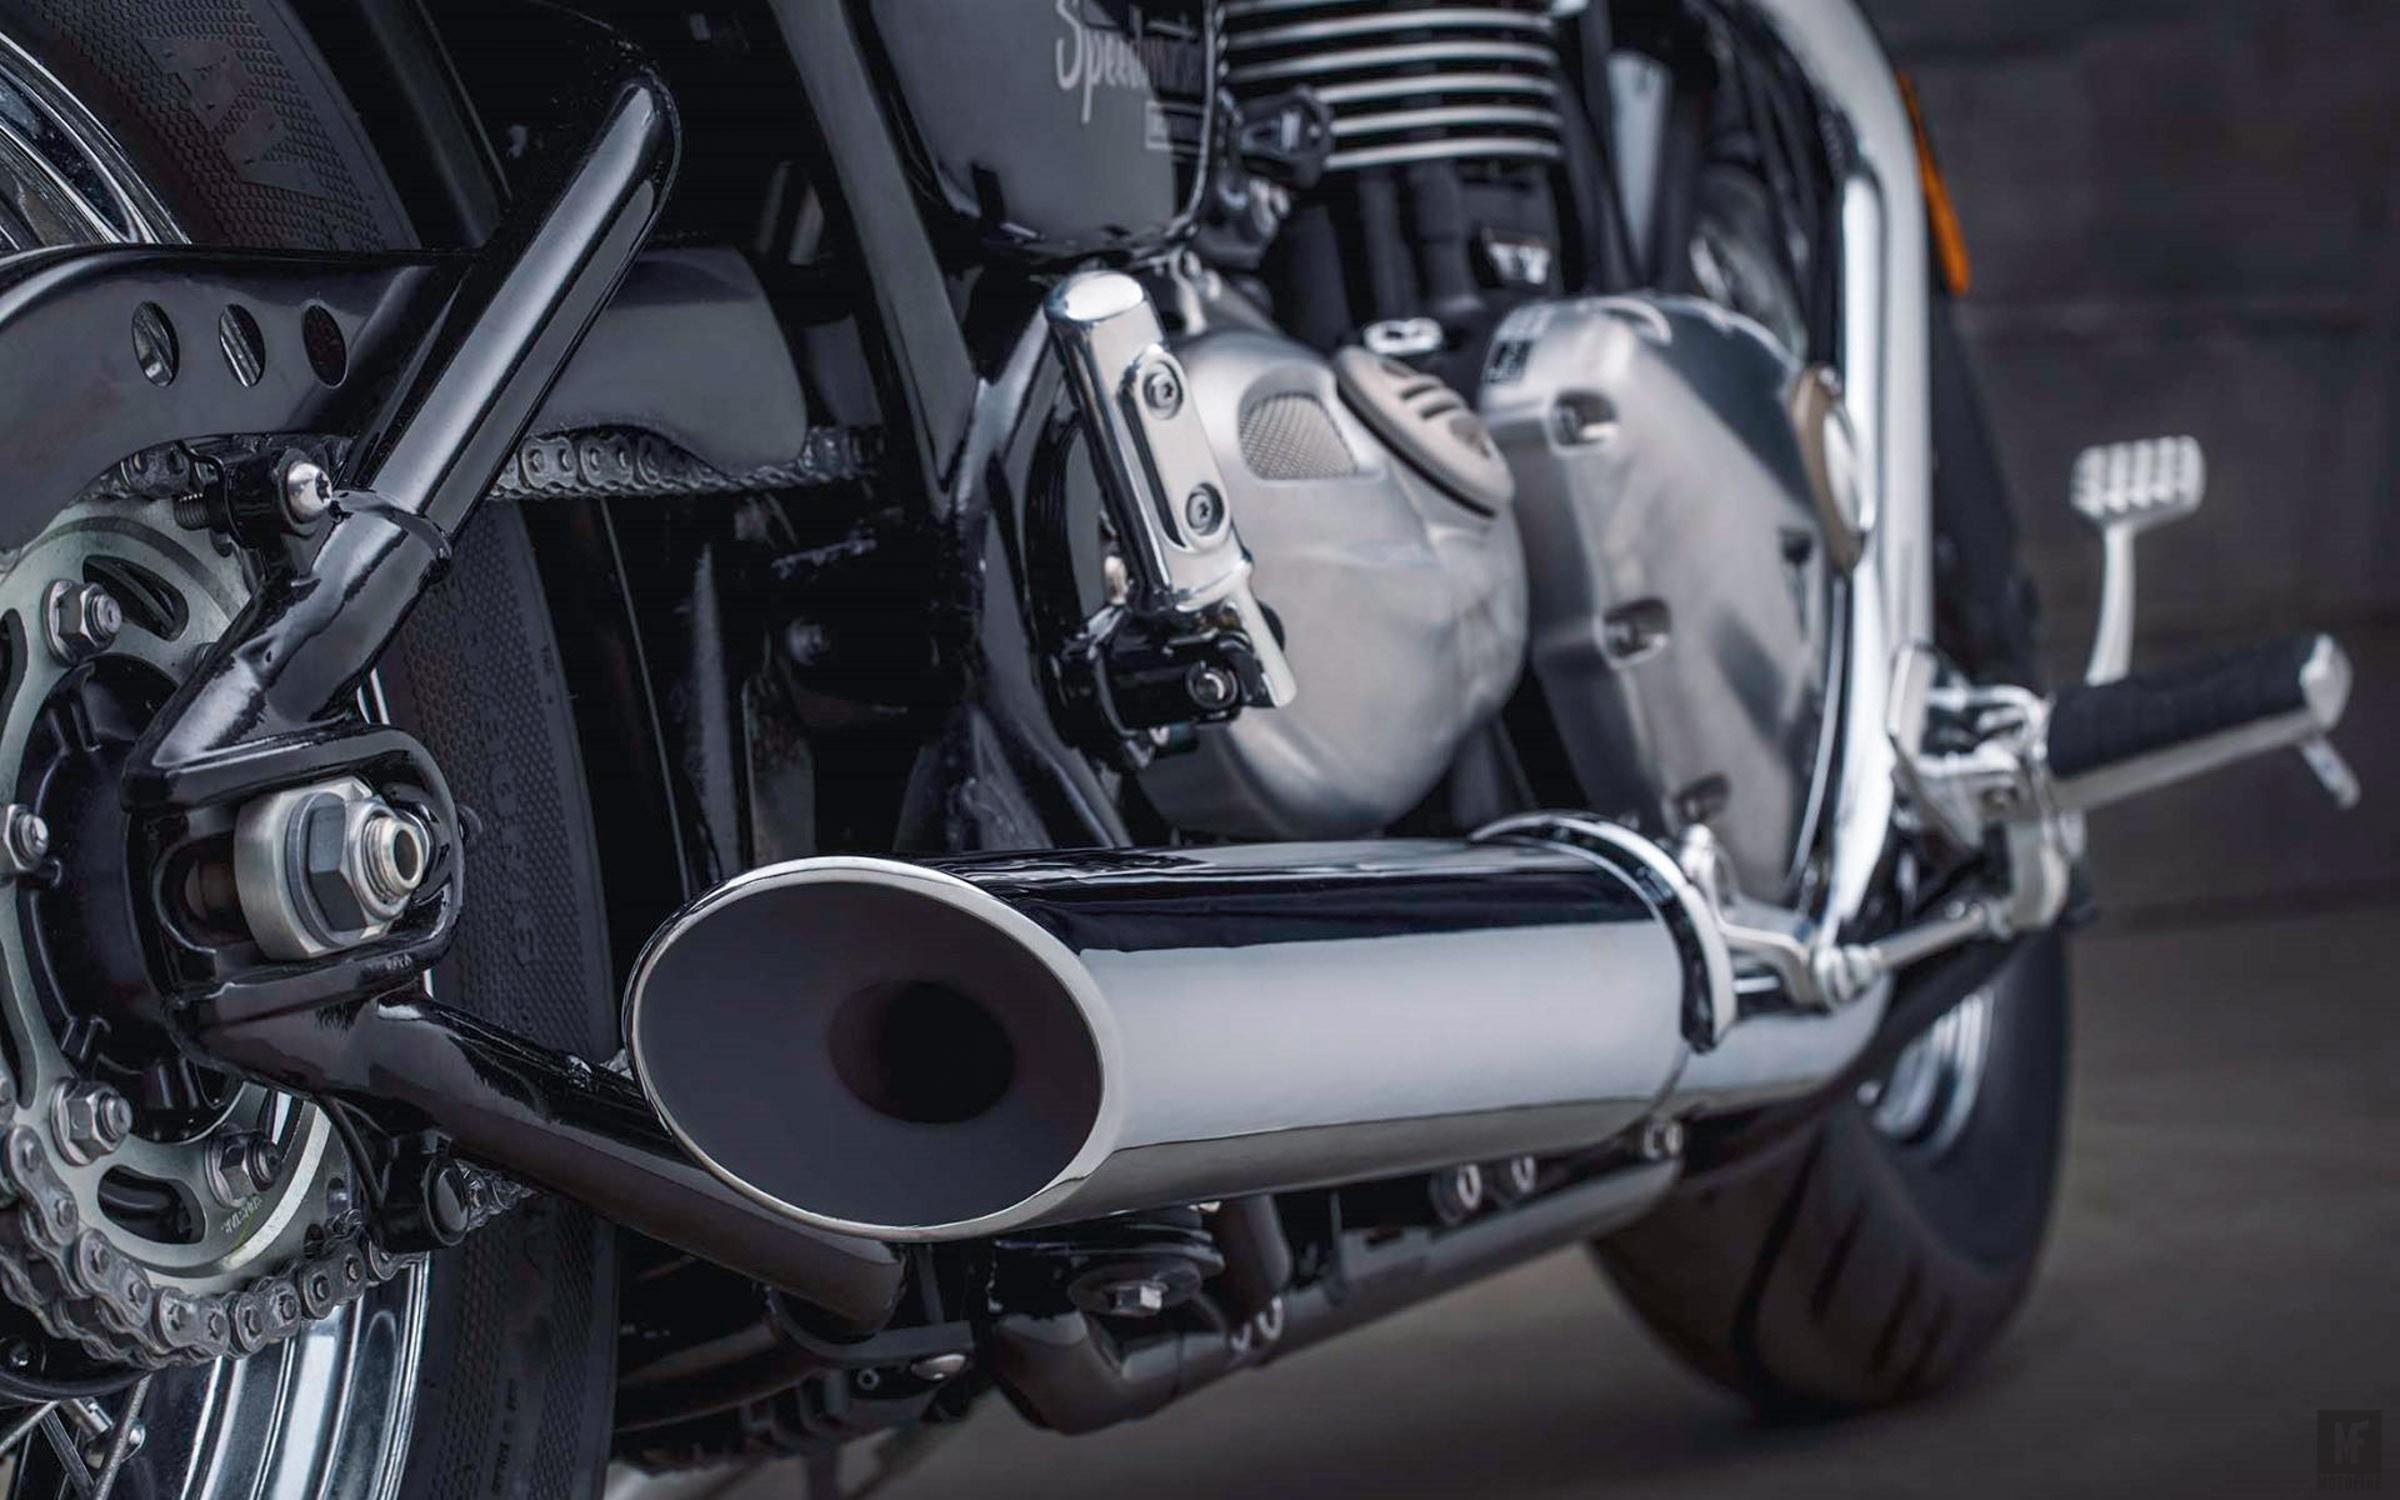 Triumph-Bonneville-Speedmaster-2018-Motofire-8.jpg